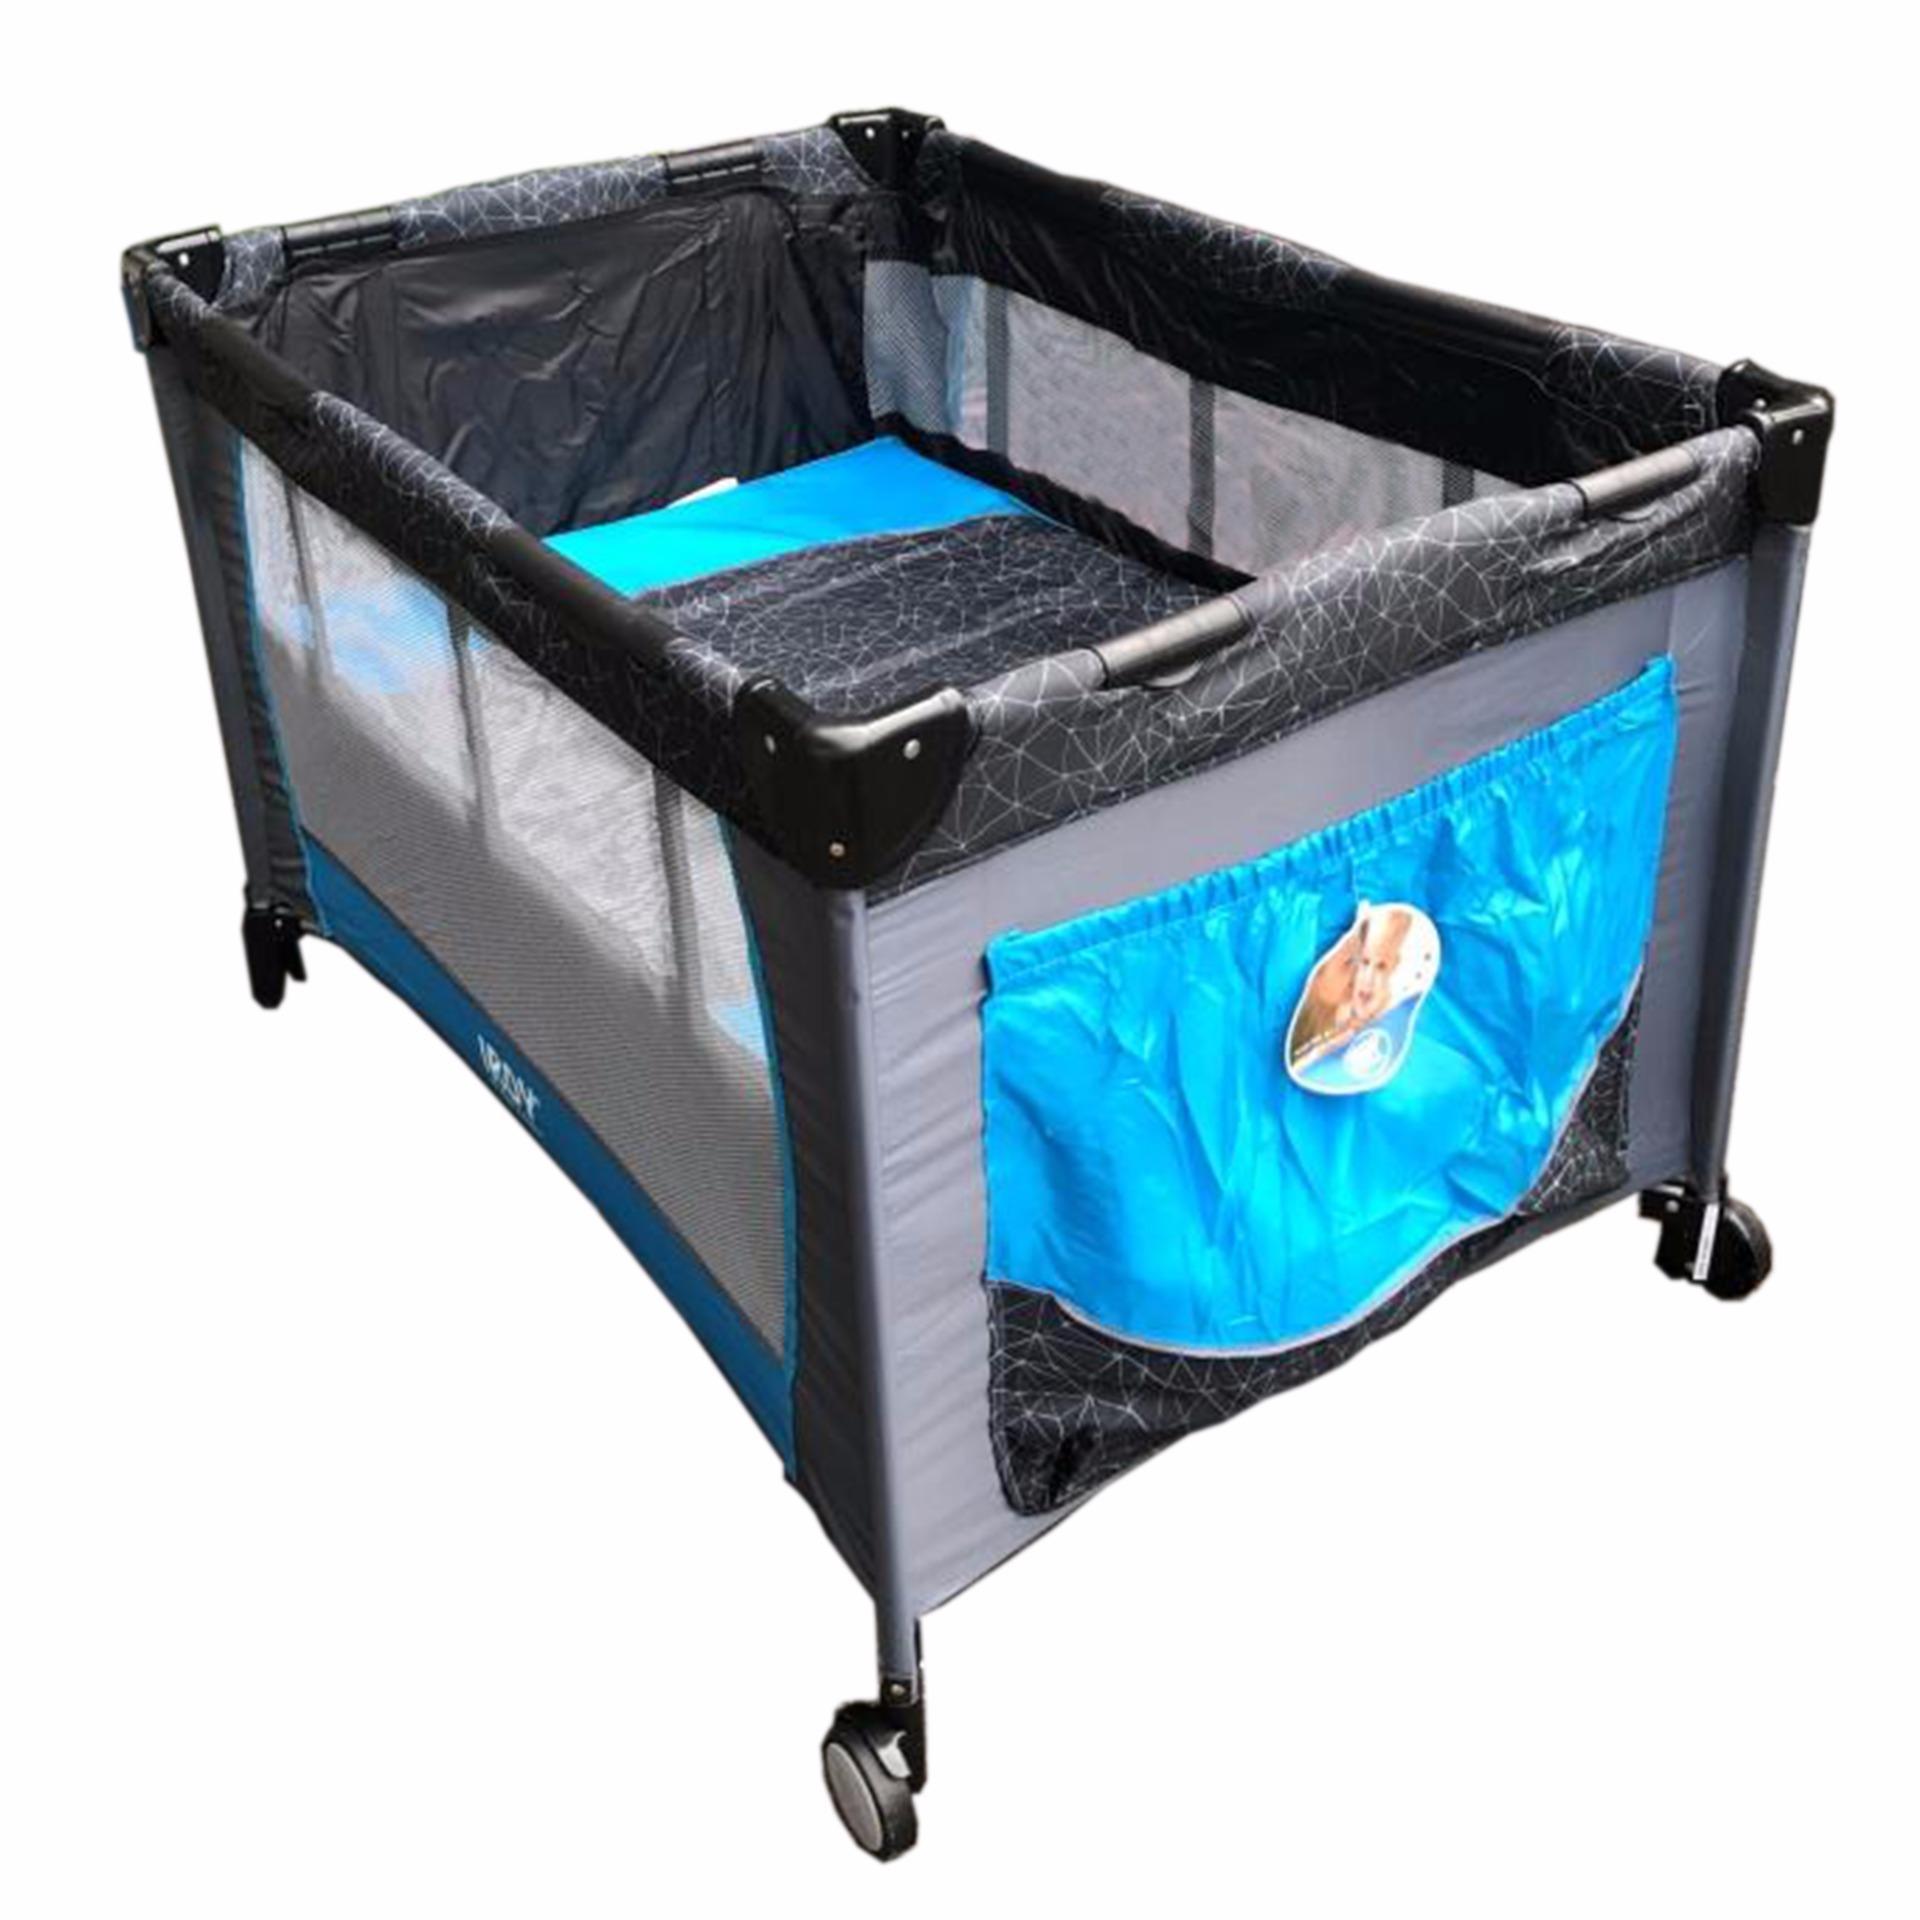 Crib for sale tarlac - Crib For Sale Tarlac 41